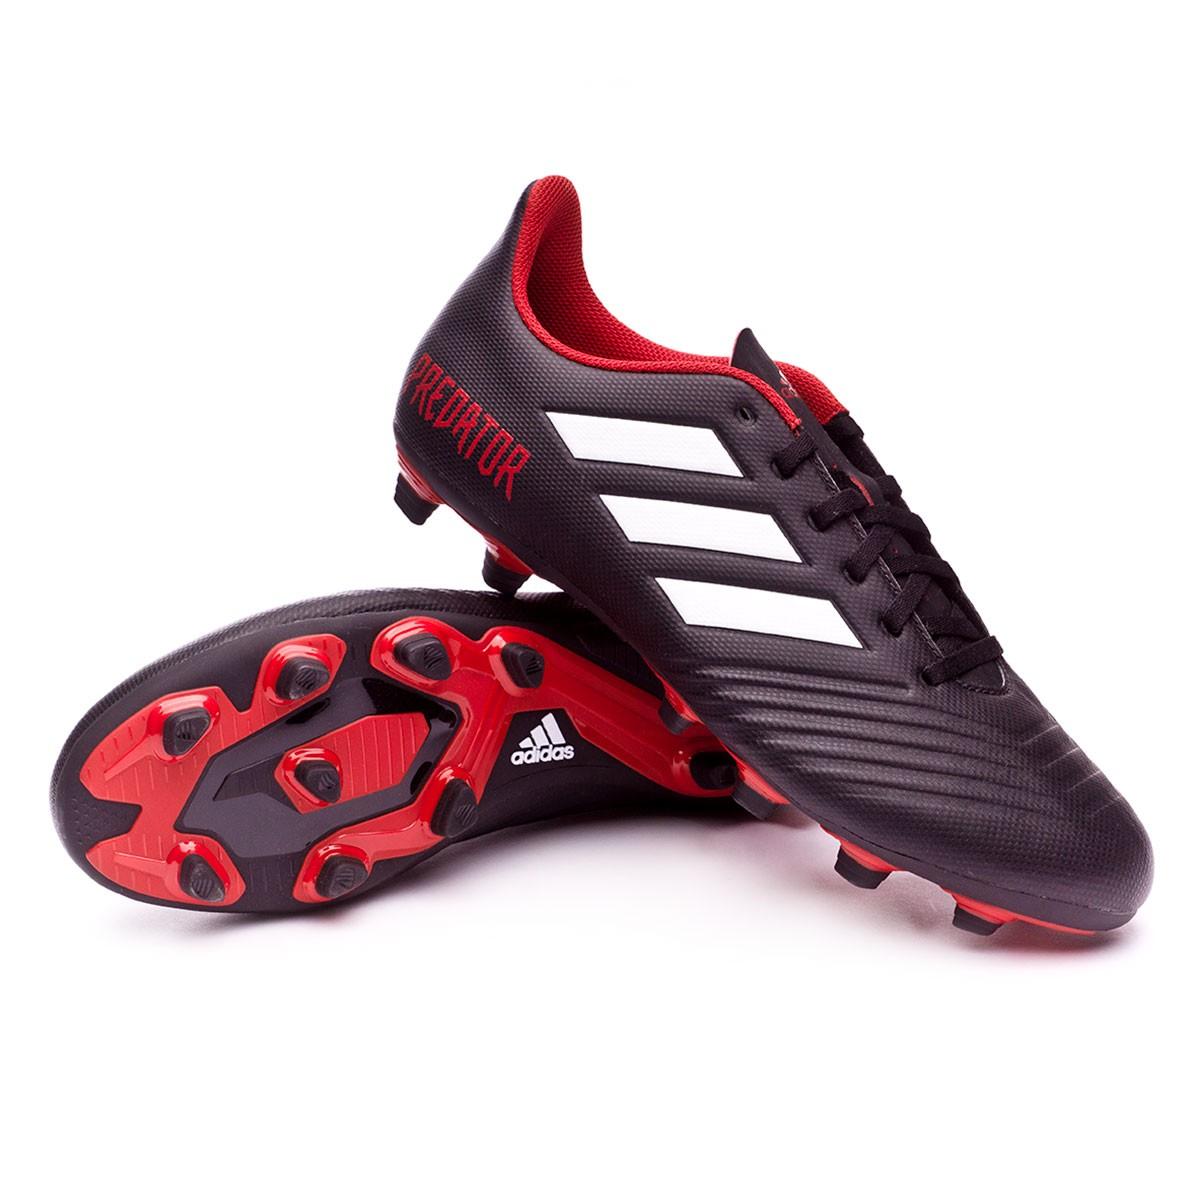 2c3151e19b316 adidas Predator 18.4 FxG Football Boots. Core black-White-Red ...